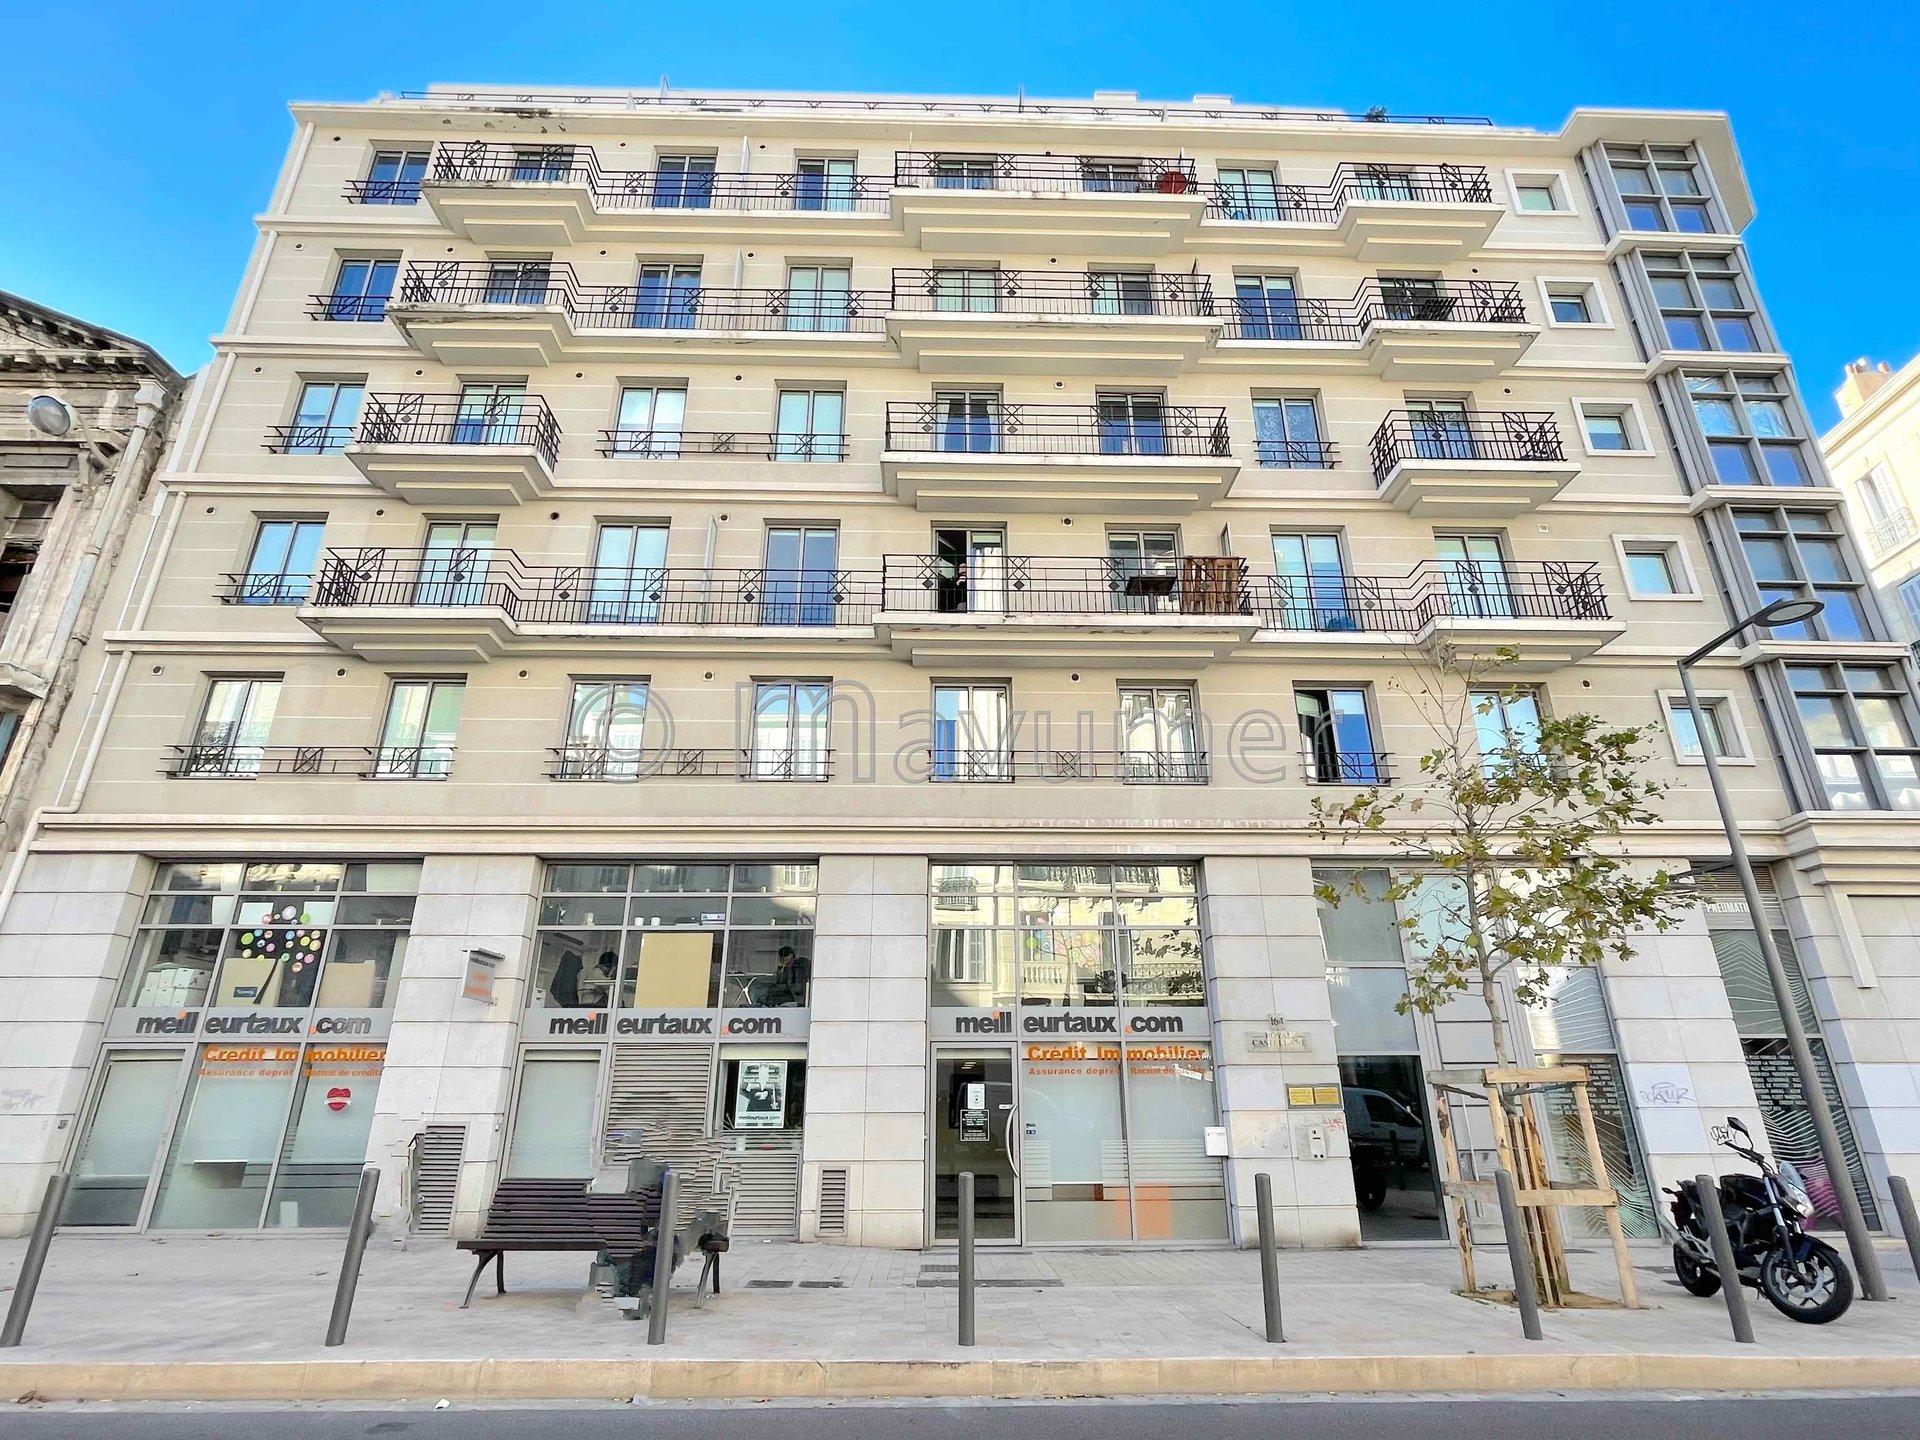 Appartement T2 13006 Marseille Cours Lieutaud-Castellane